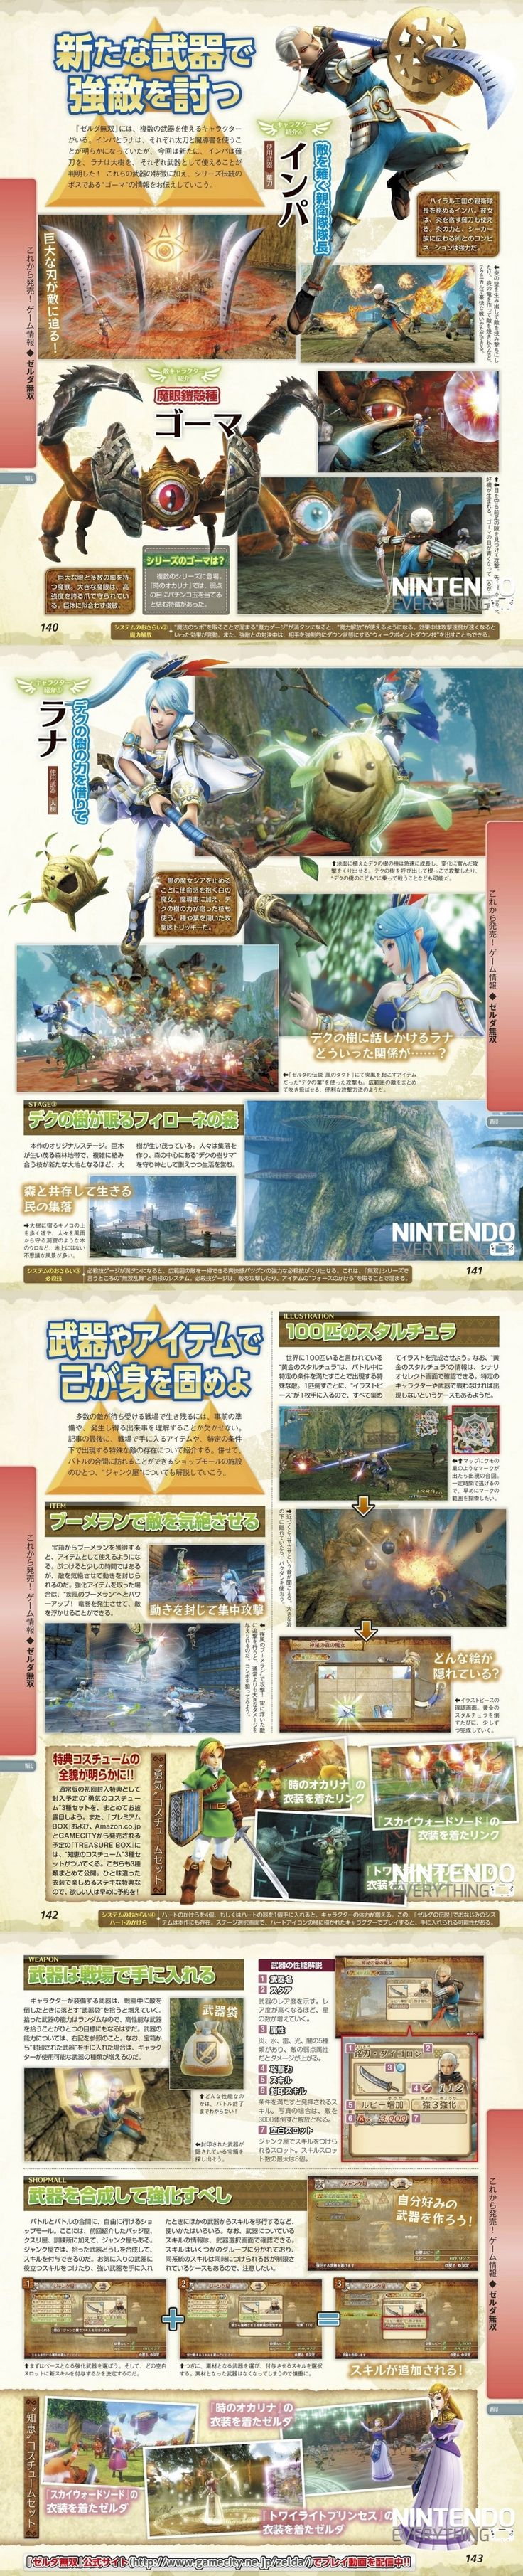 How to defeat gohma in hyrule warriors -  Famitsu Scans Update From Zelda Hyrule Warriors With Sheik Darunia Ruto